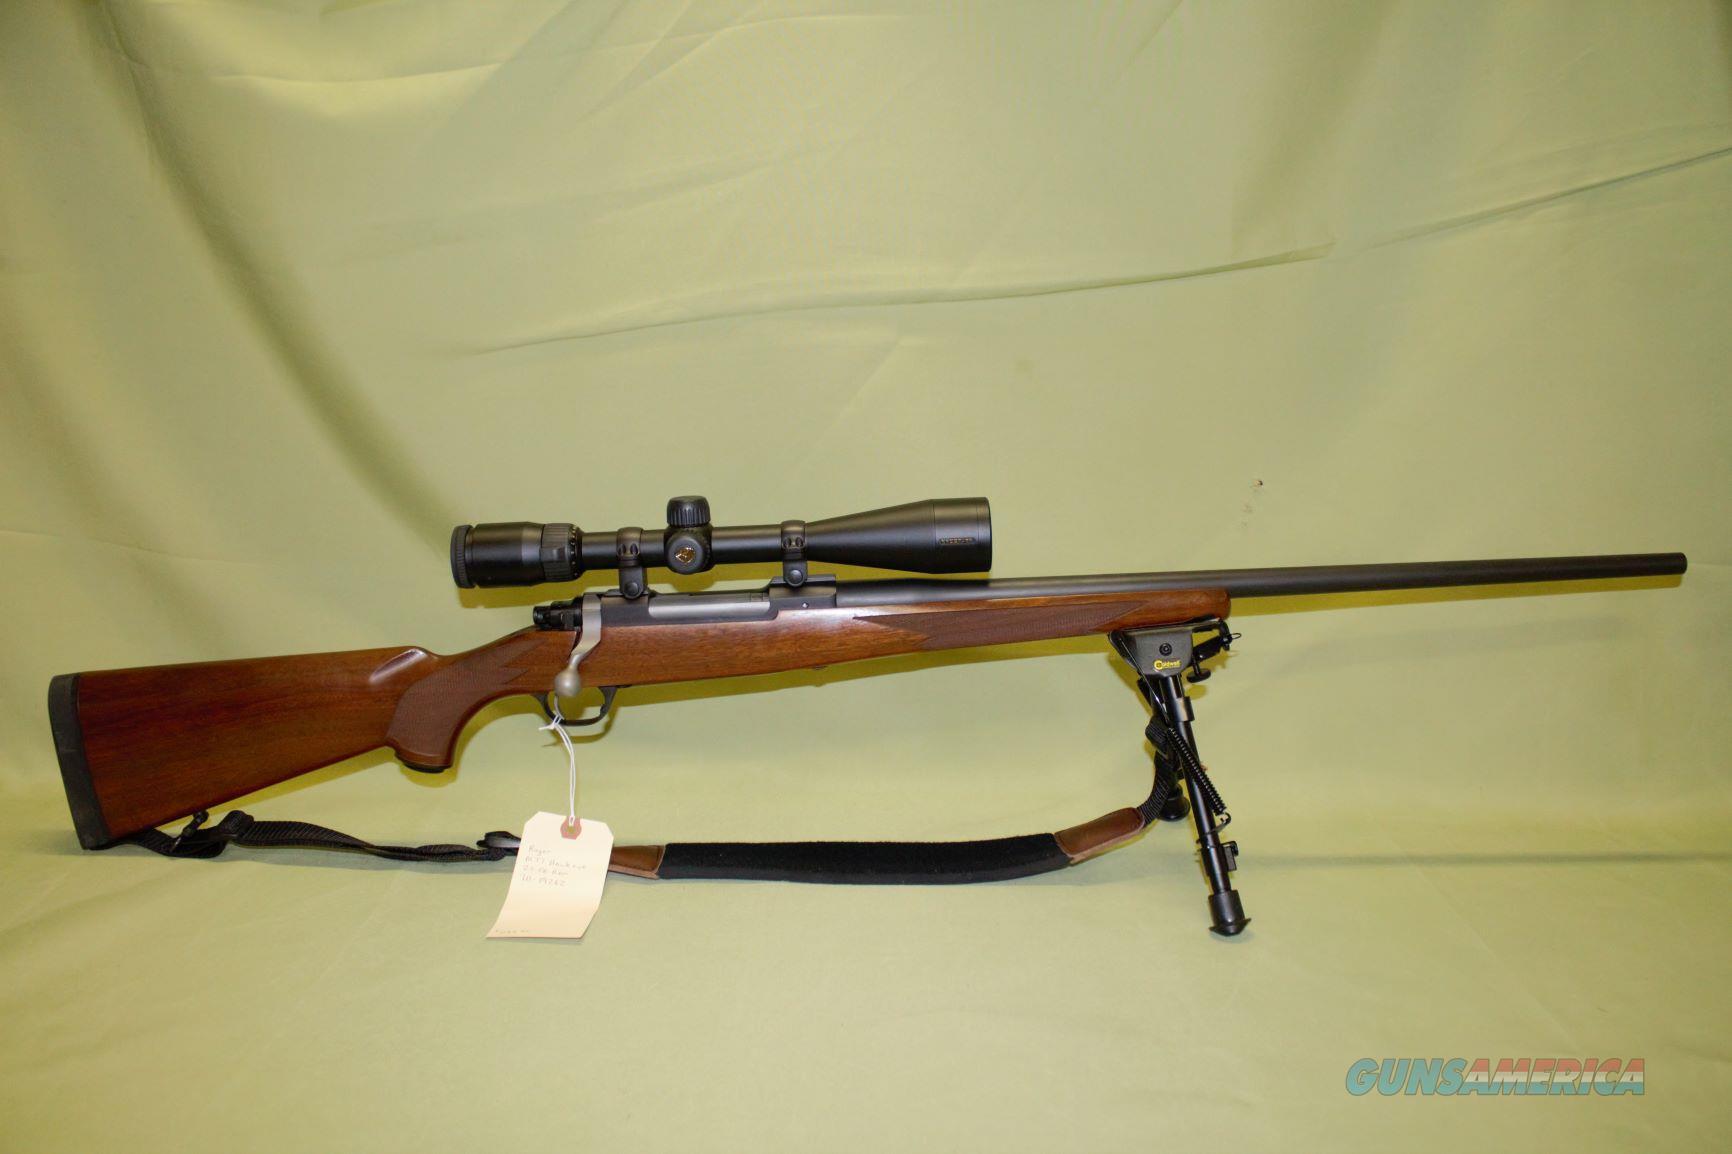 Ruger M77 Hawkeye 25-06  Guns > Rifles > Ruger Rifles > Model 77